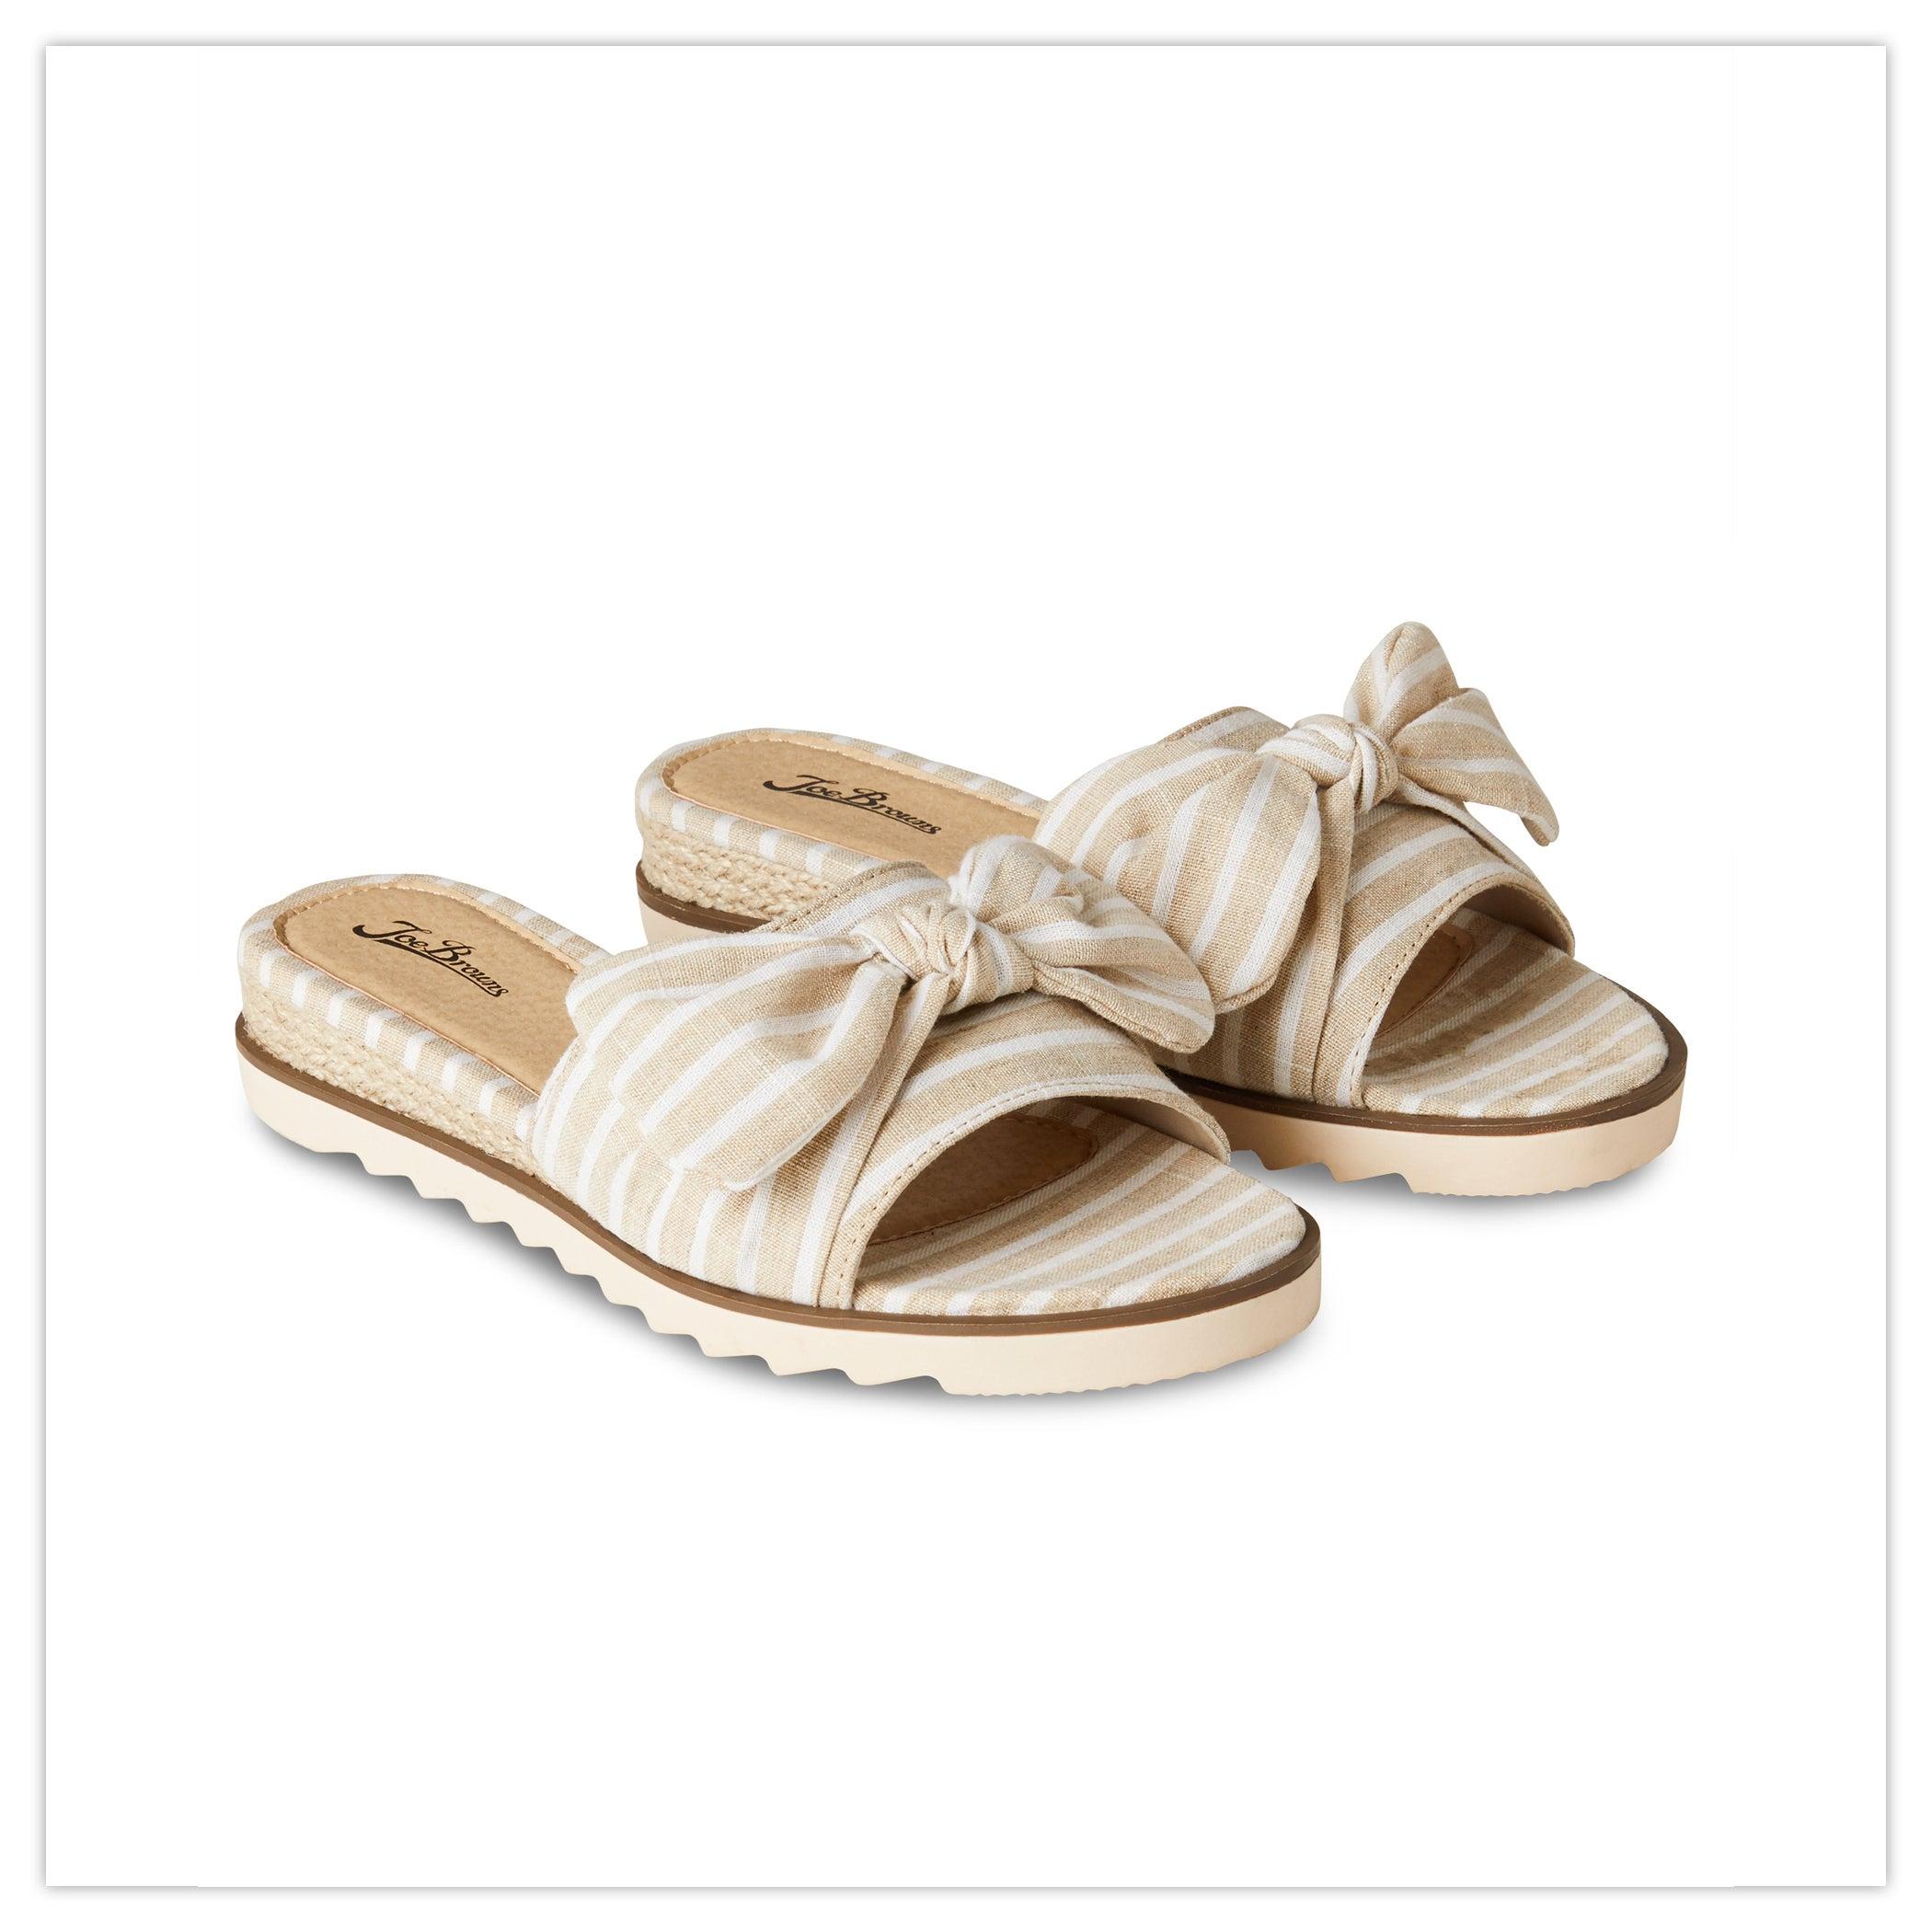 Cool & Breezy Sandals